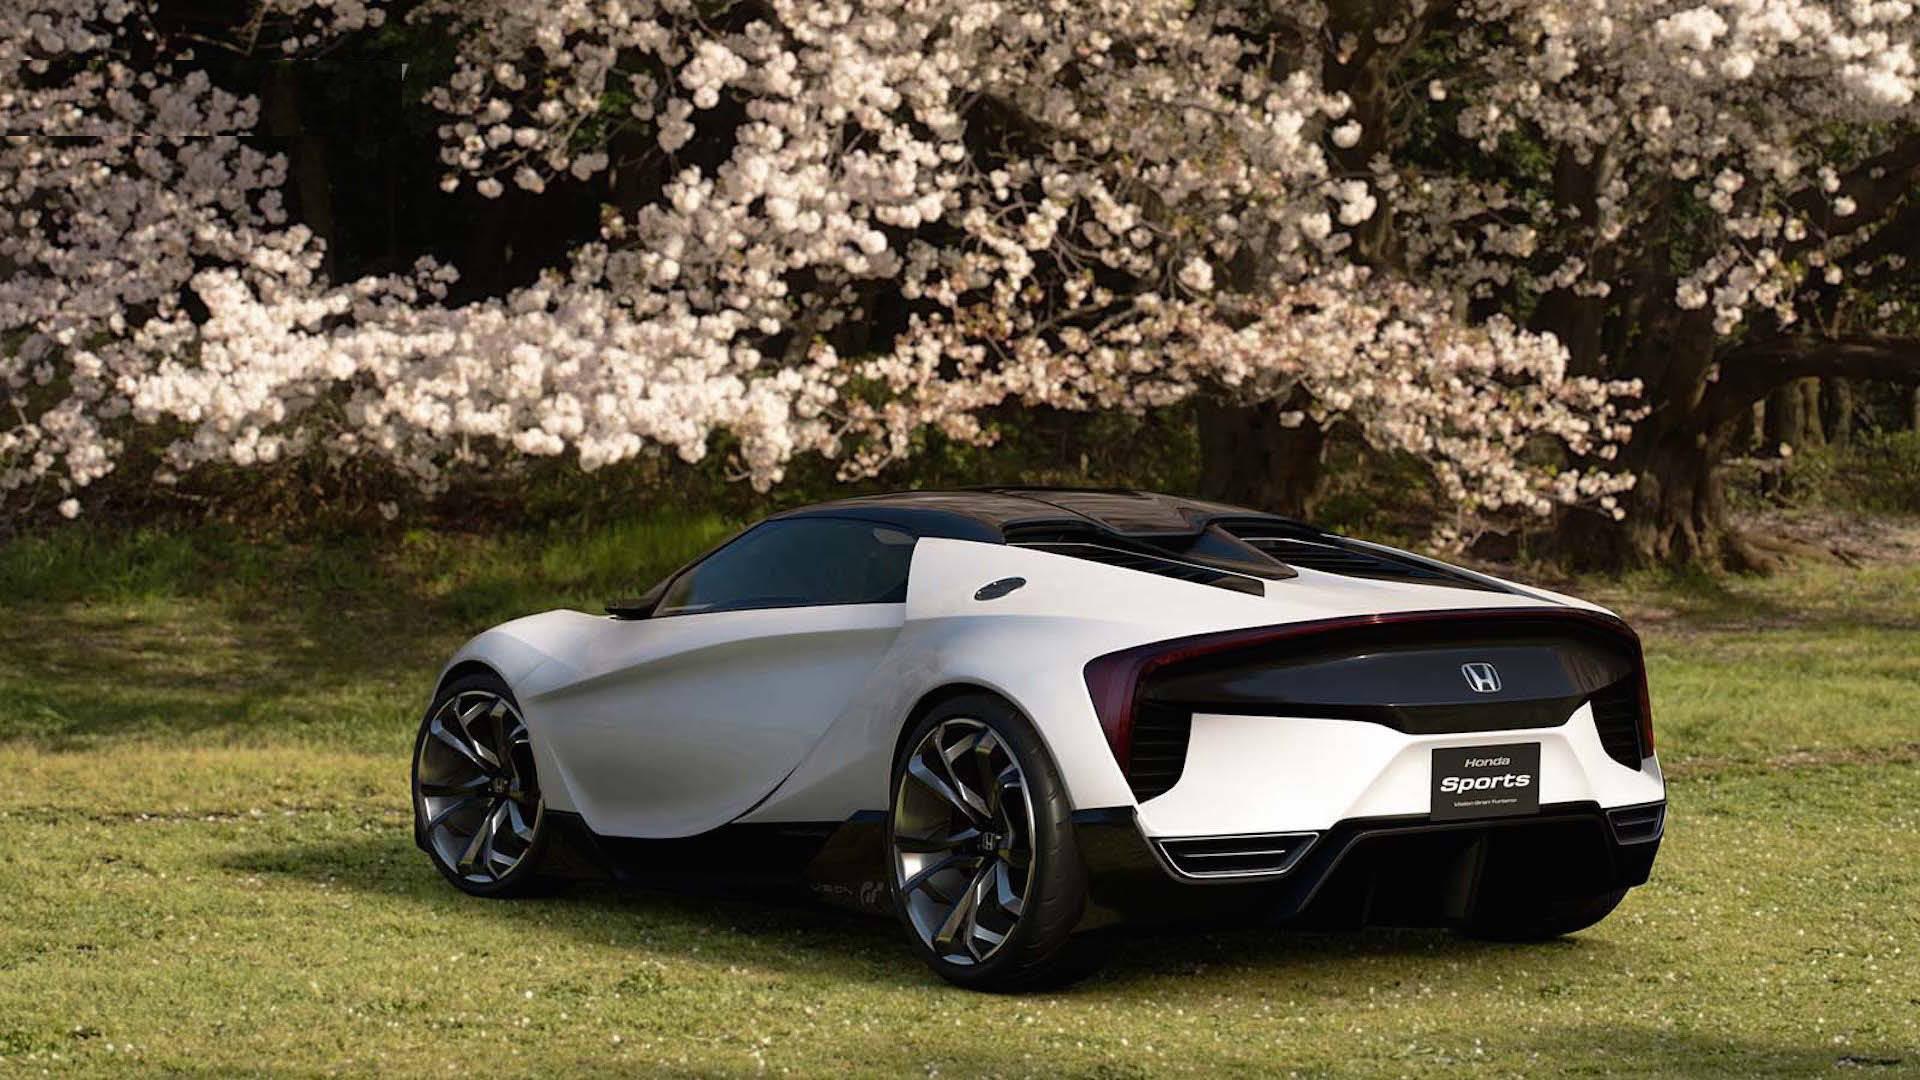 Honda Sports Vision GT